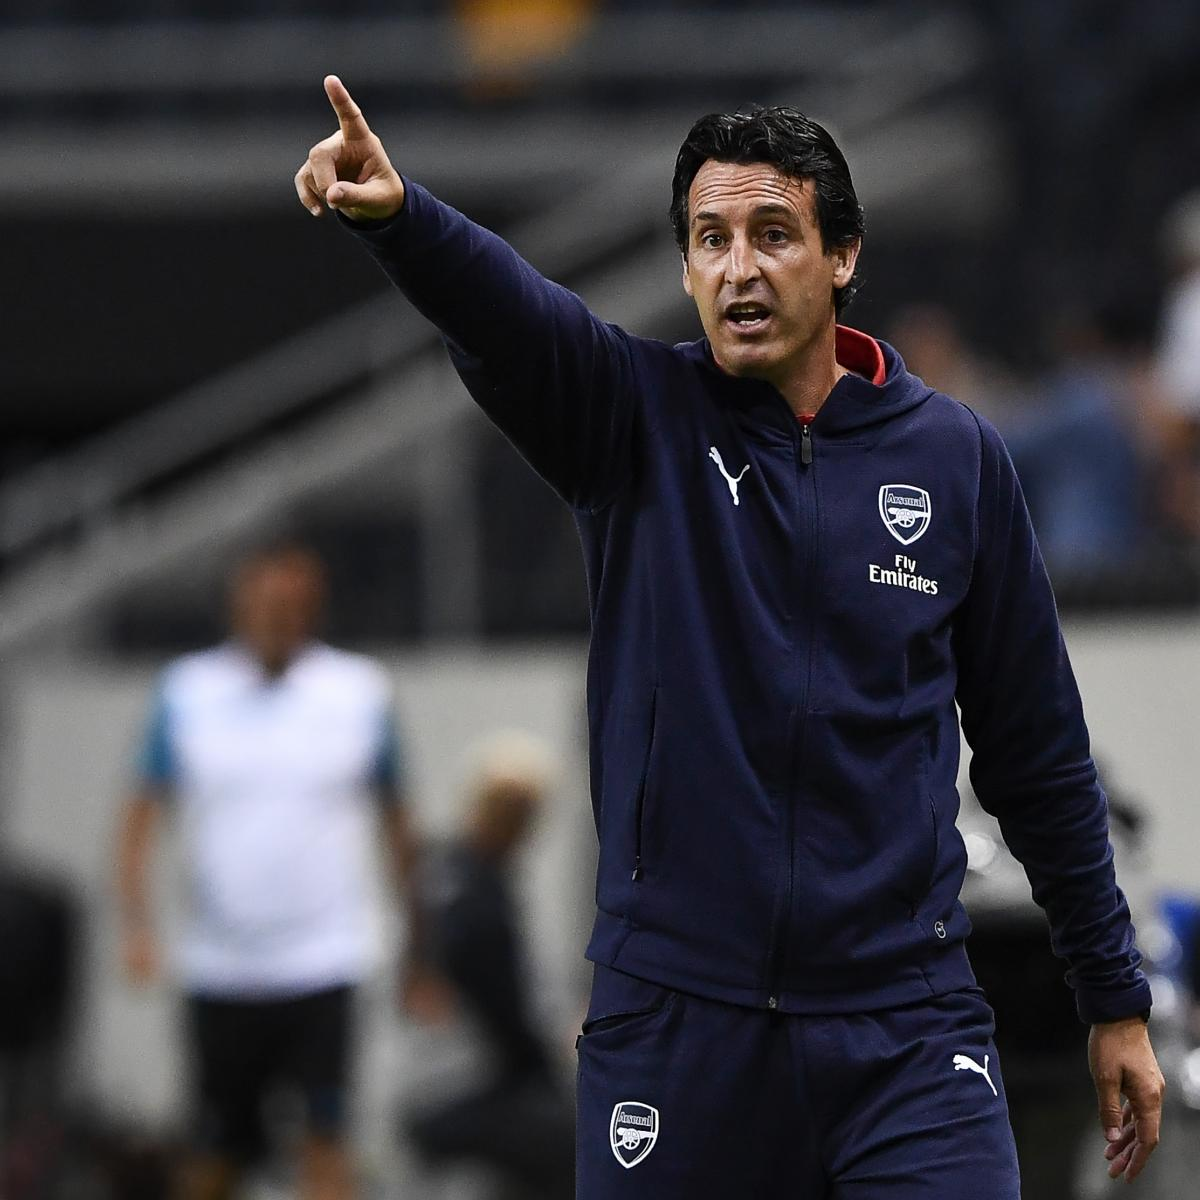 Arsenal vs. Manchester City: Odds, Preview, Live Stream, TV Info